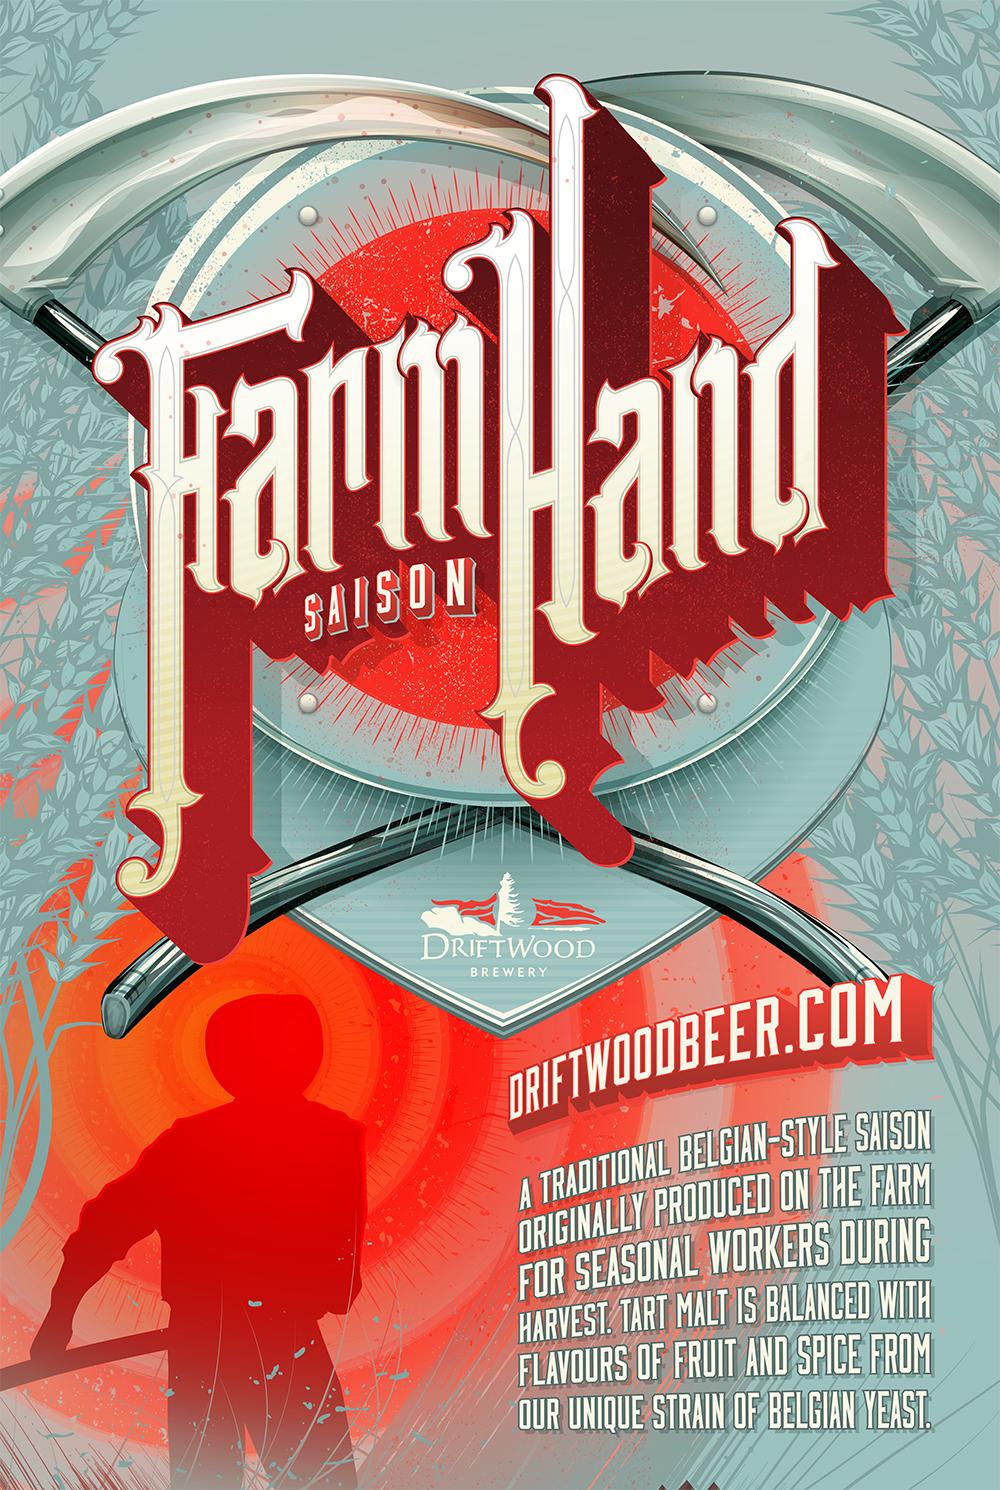 Poster Design for Driftwood Brewery's Farmhand Saison